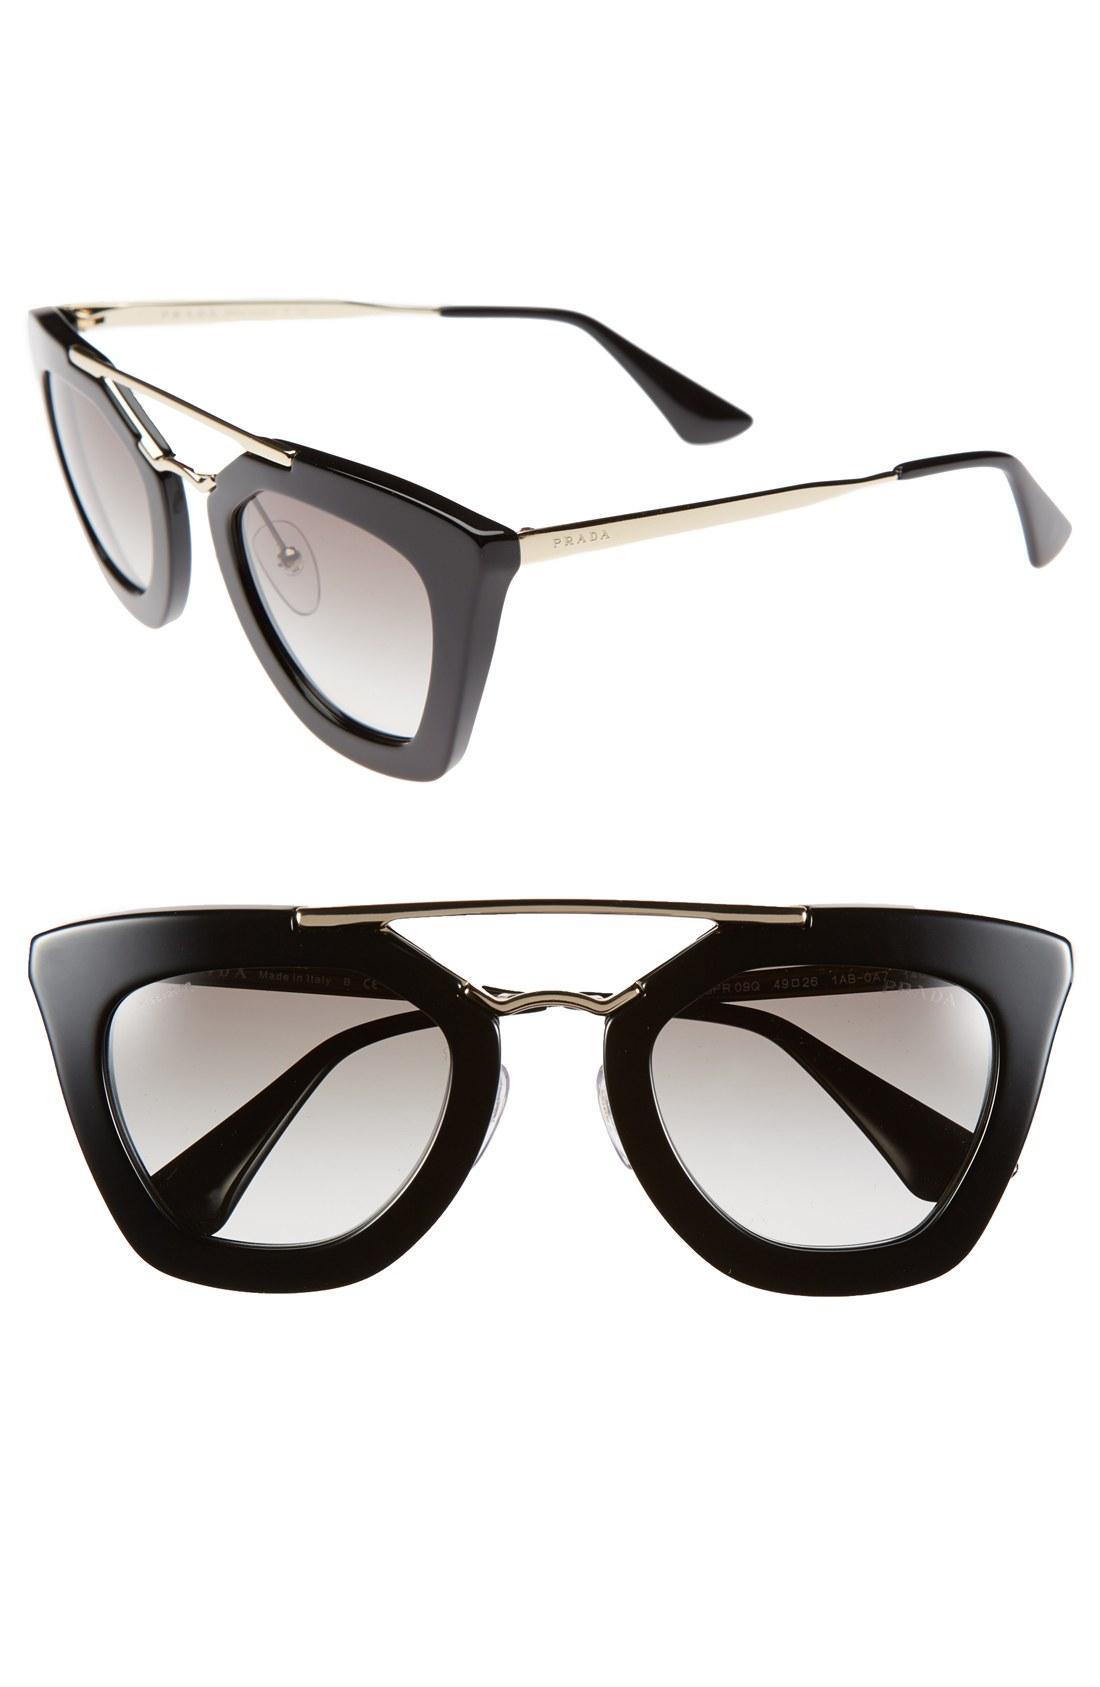 Glasses Frames Nordstrom : Prada 49mm Retro Sunglasses Nordstrom